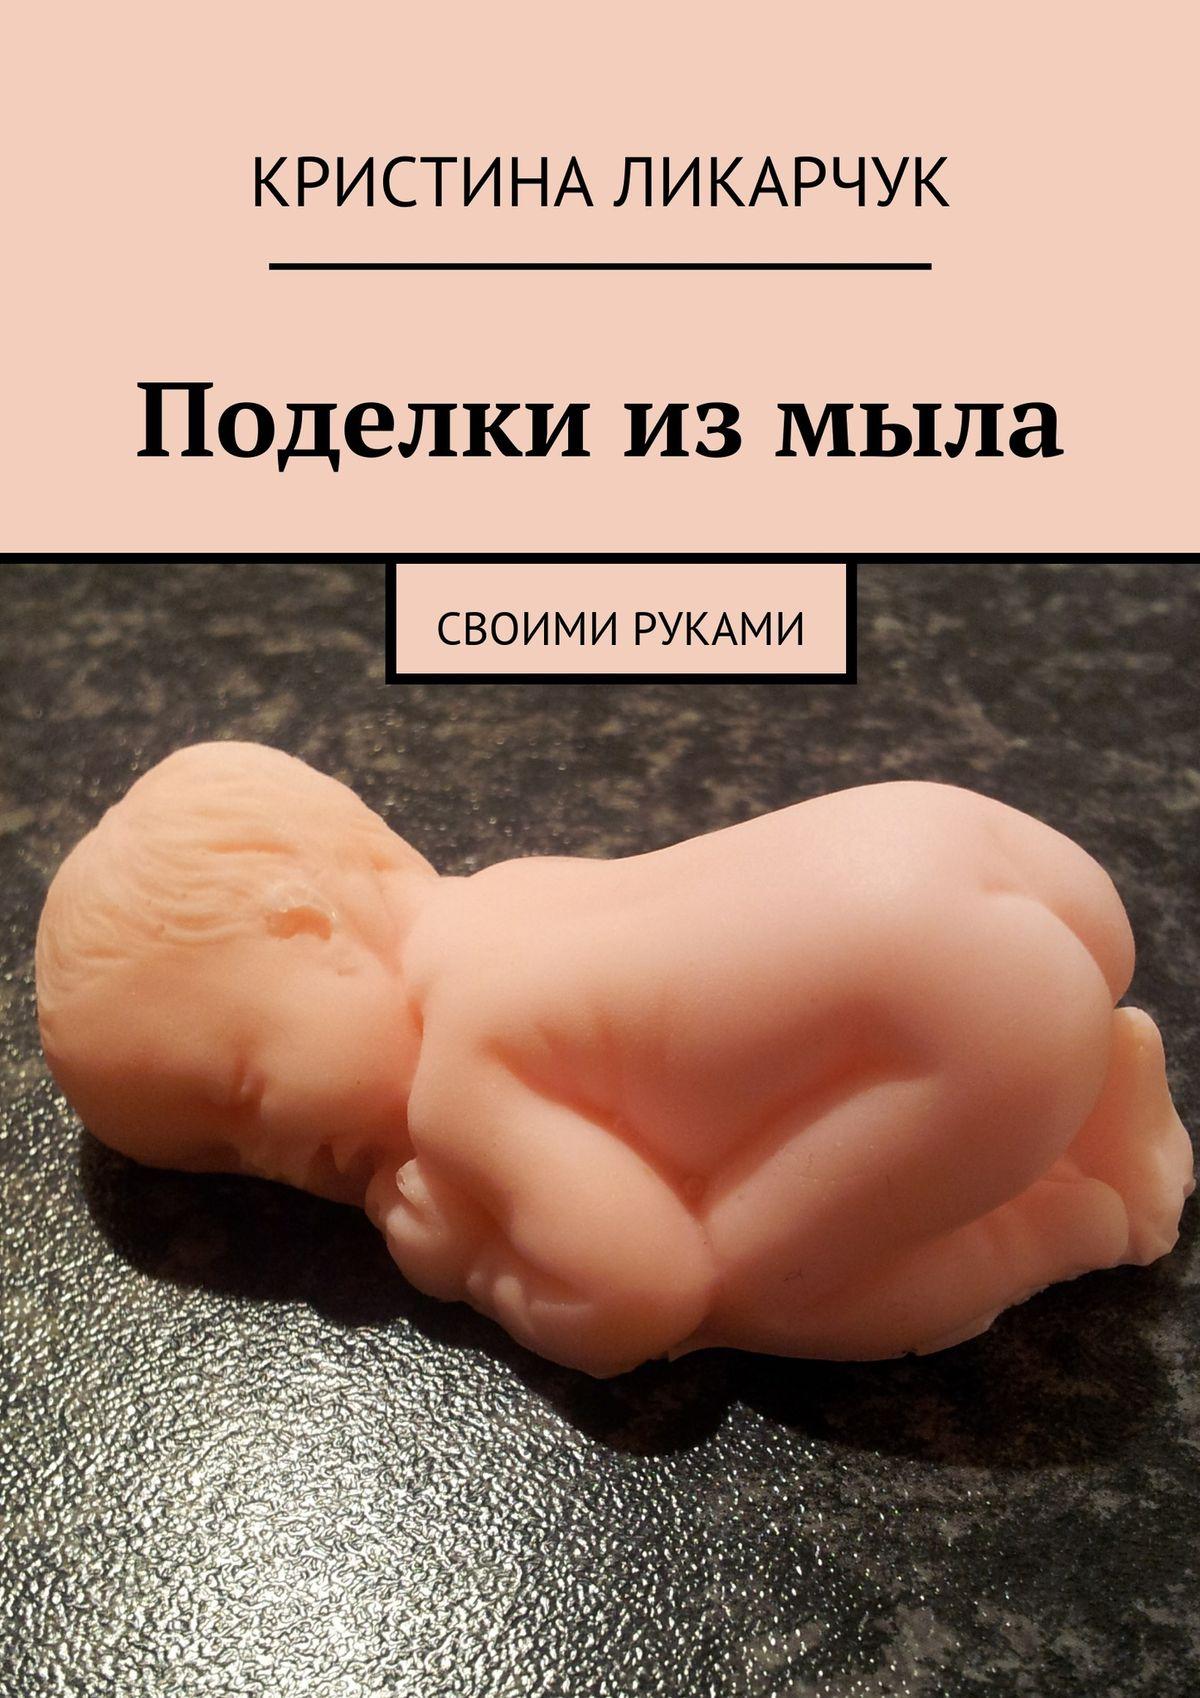 Кристина Викторовна Ликарчук Поделки измыла. Своими руками